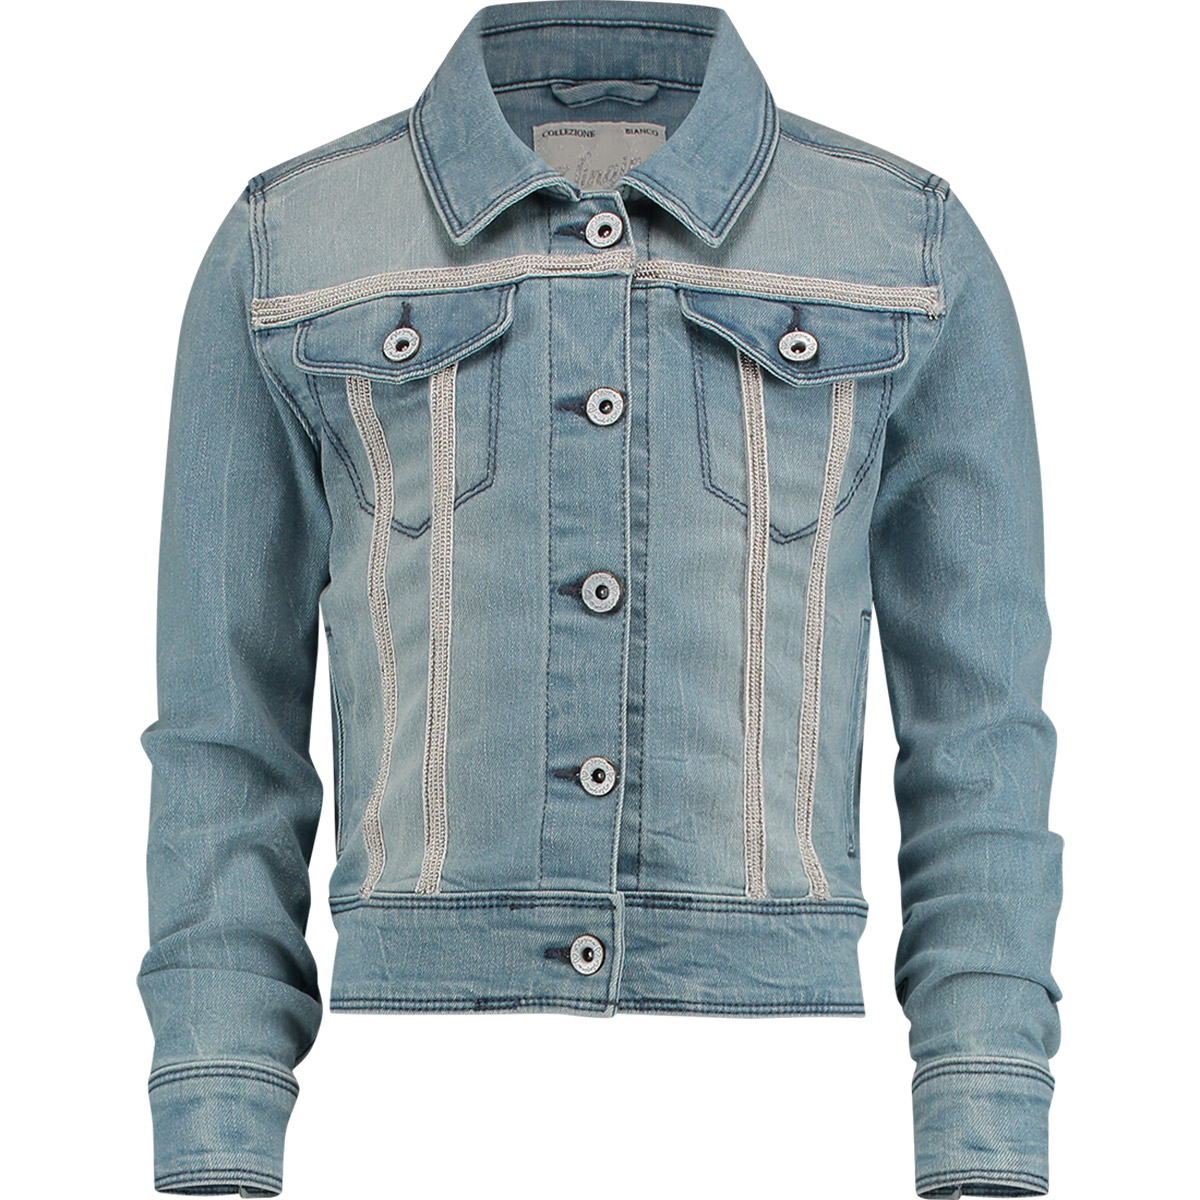 b4688024e41 Vingino Meisjes jassen & blazers - kleertjes.com